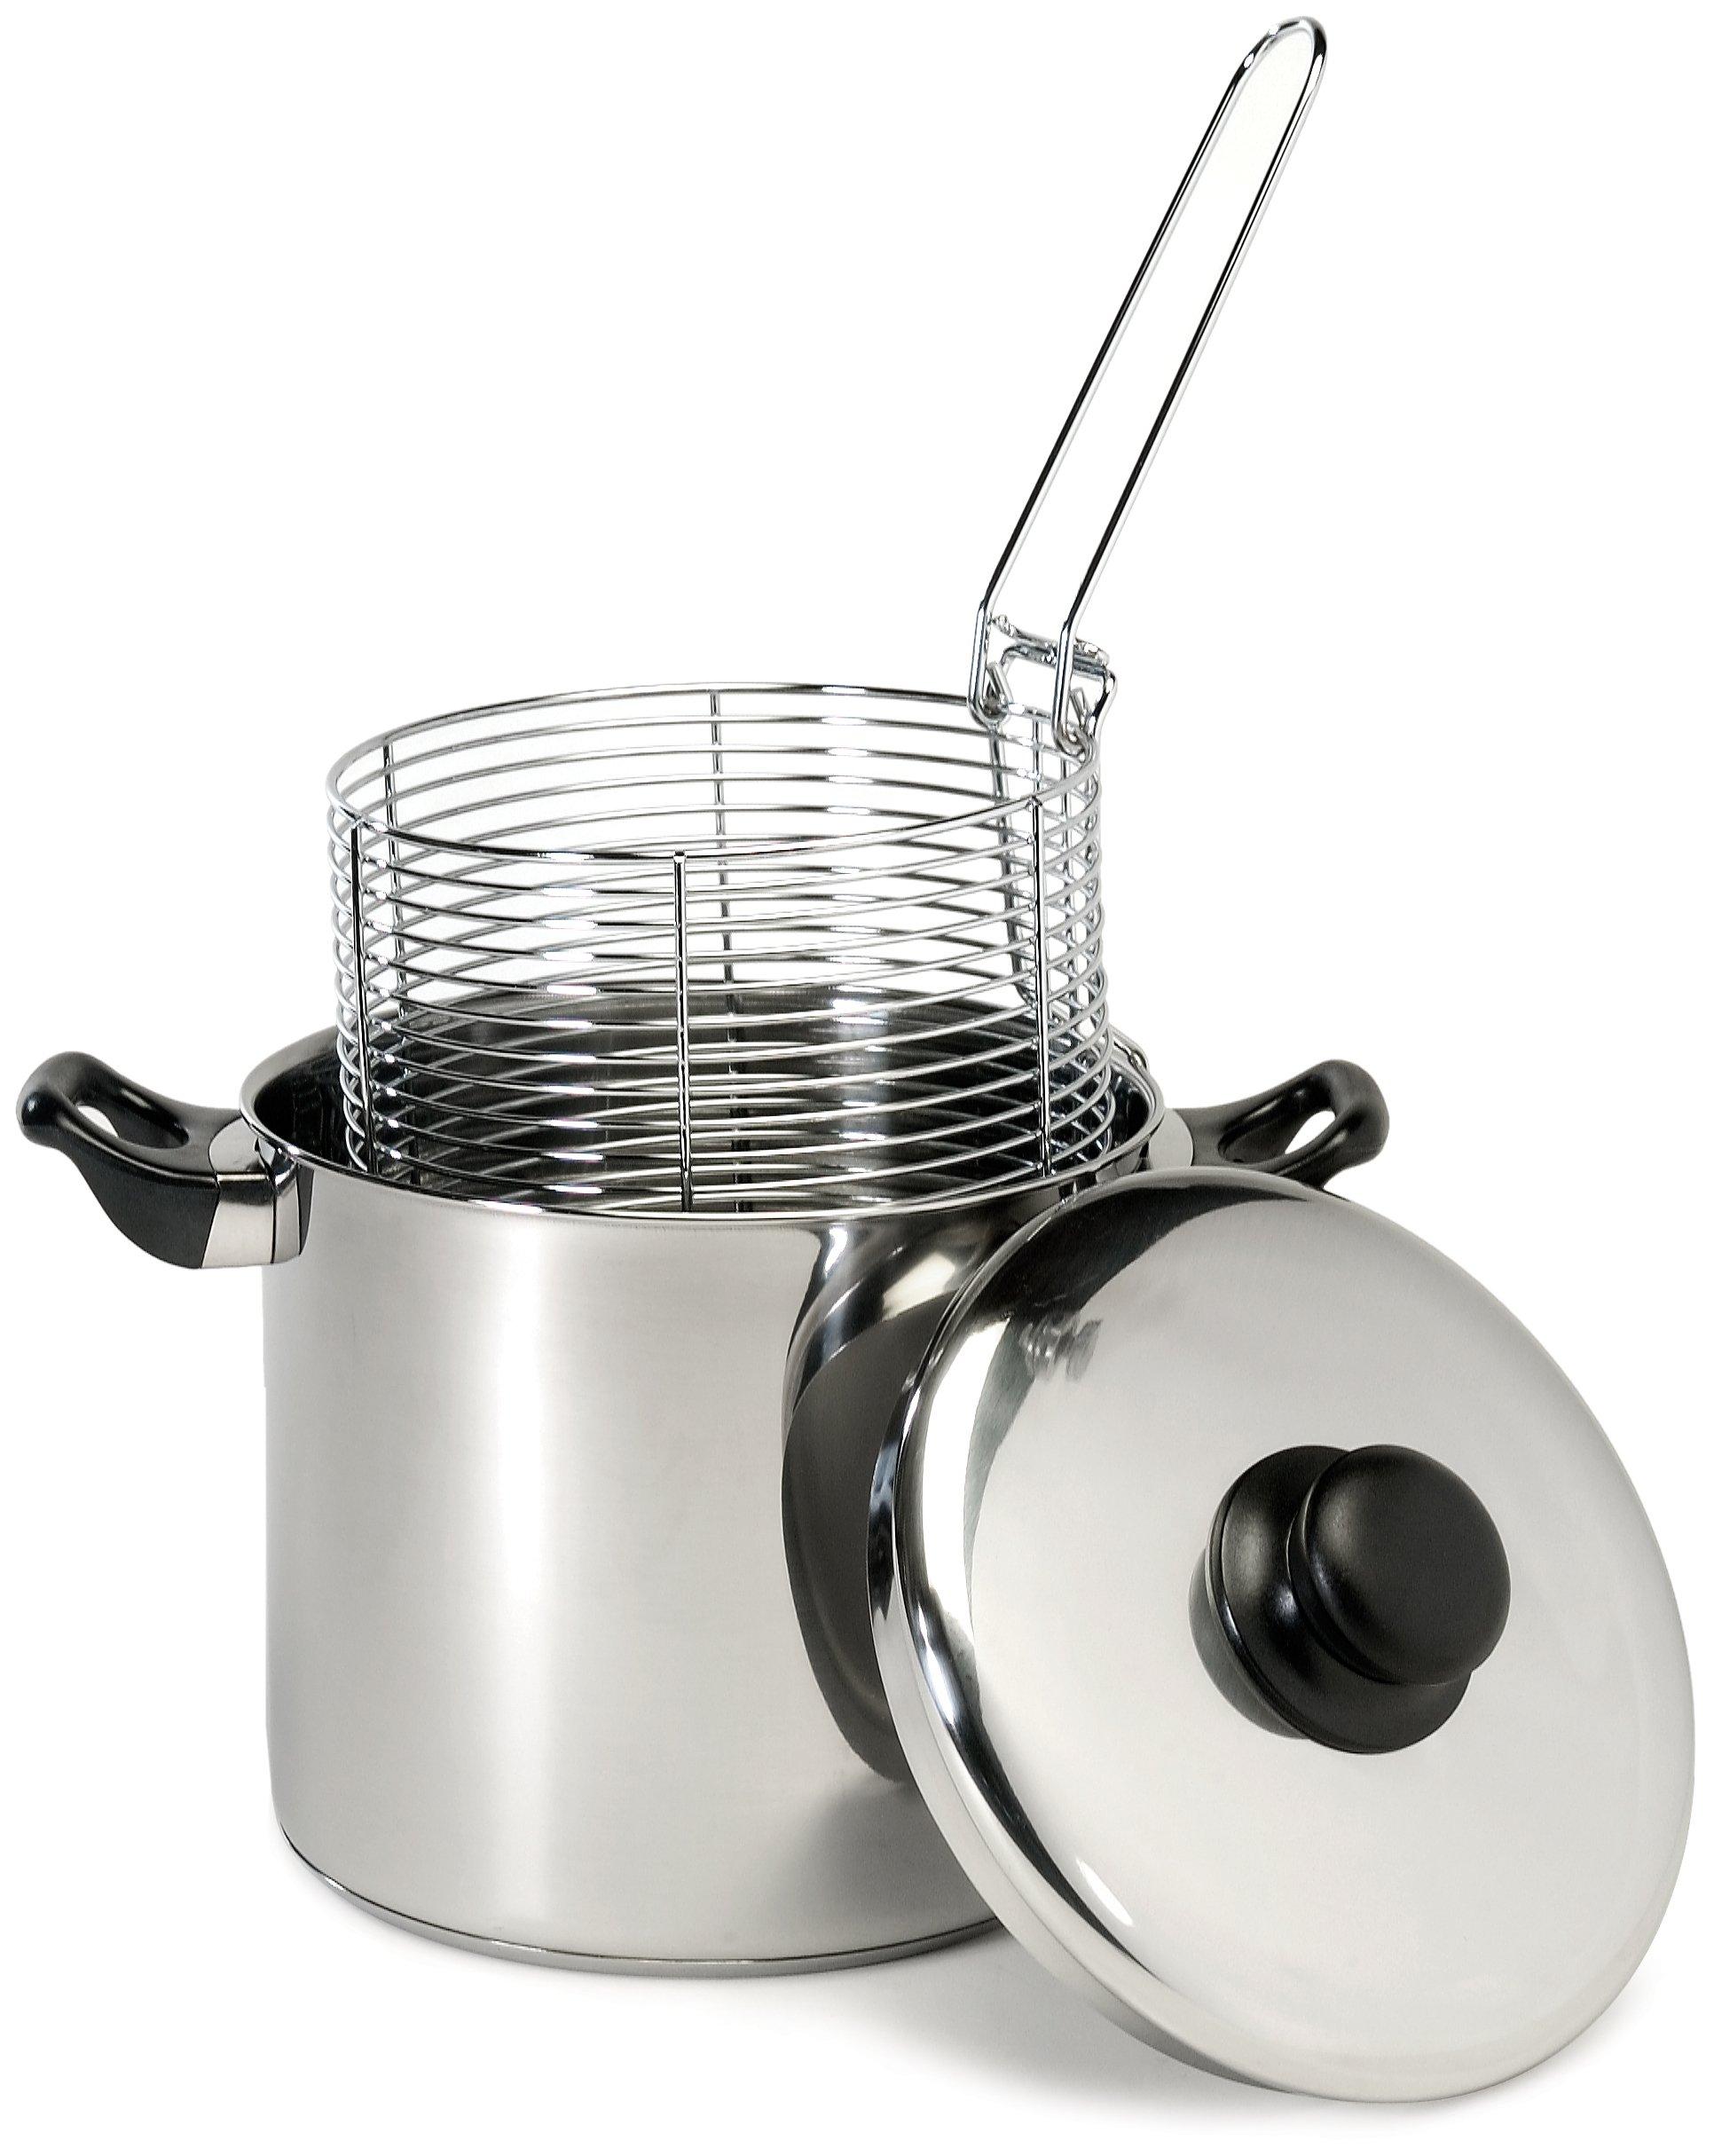 Excelsteel 6 Quart Stainless Steel Stove Top Deep Fryer by ExcelSteel